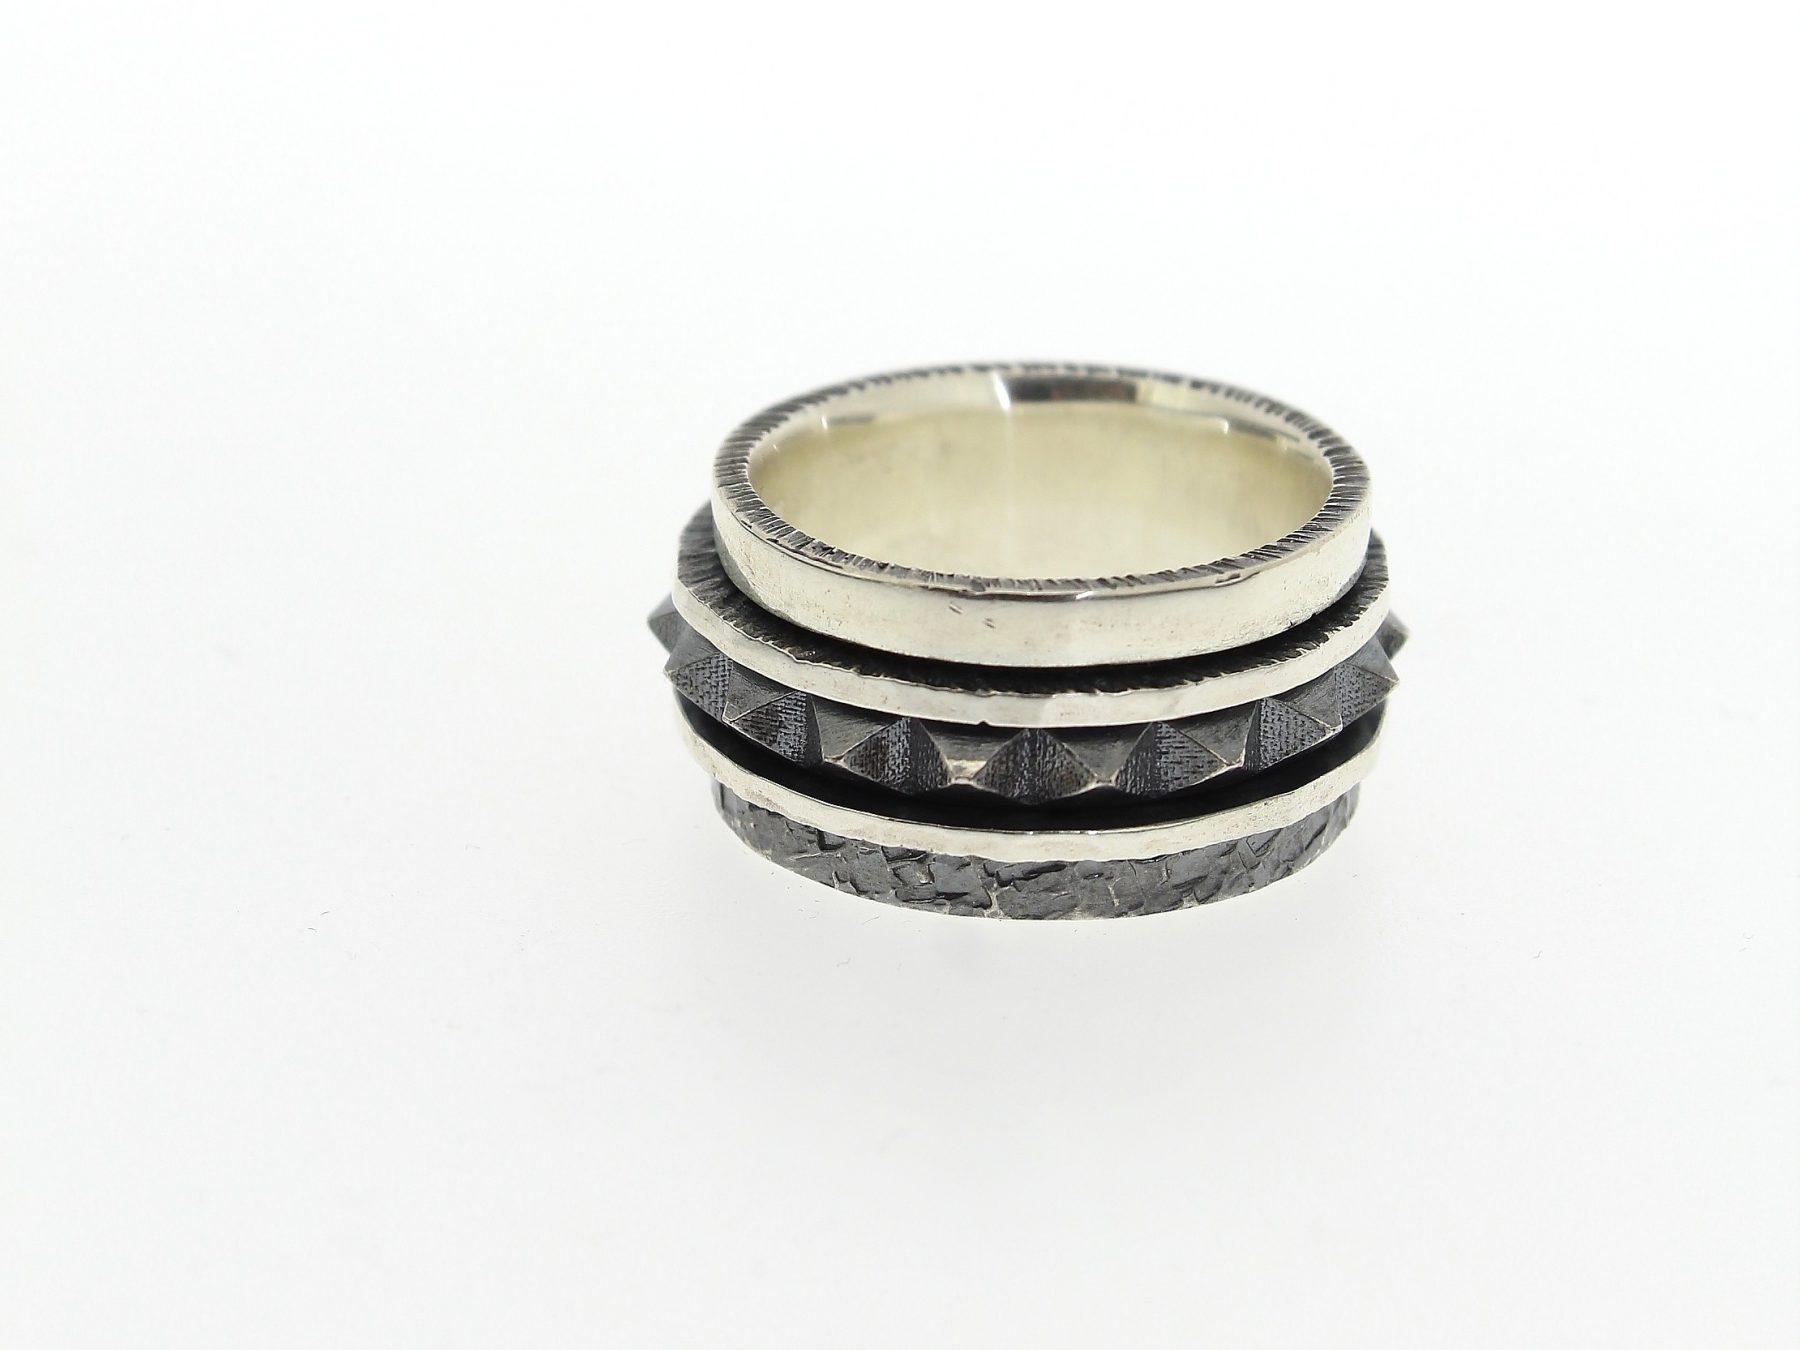 Ring 925 Silber - Individuelle Marken - 1067A